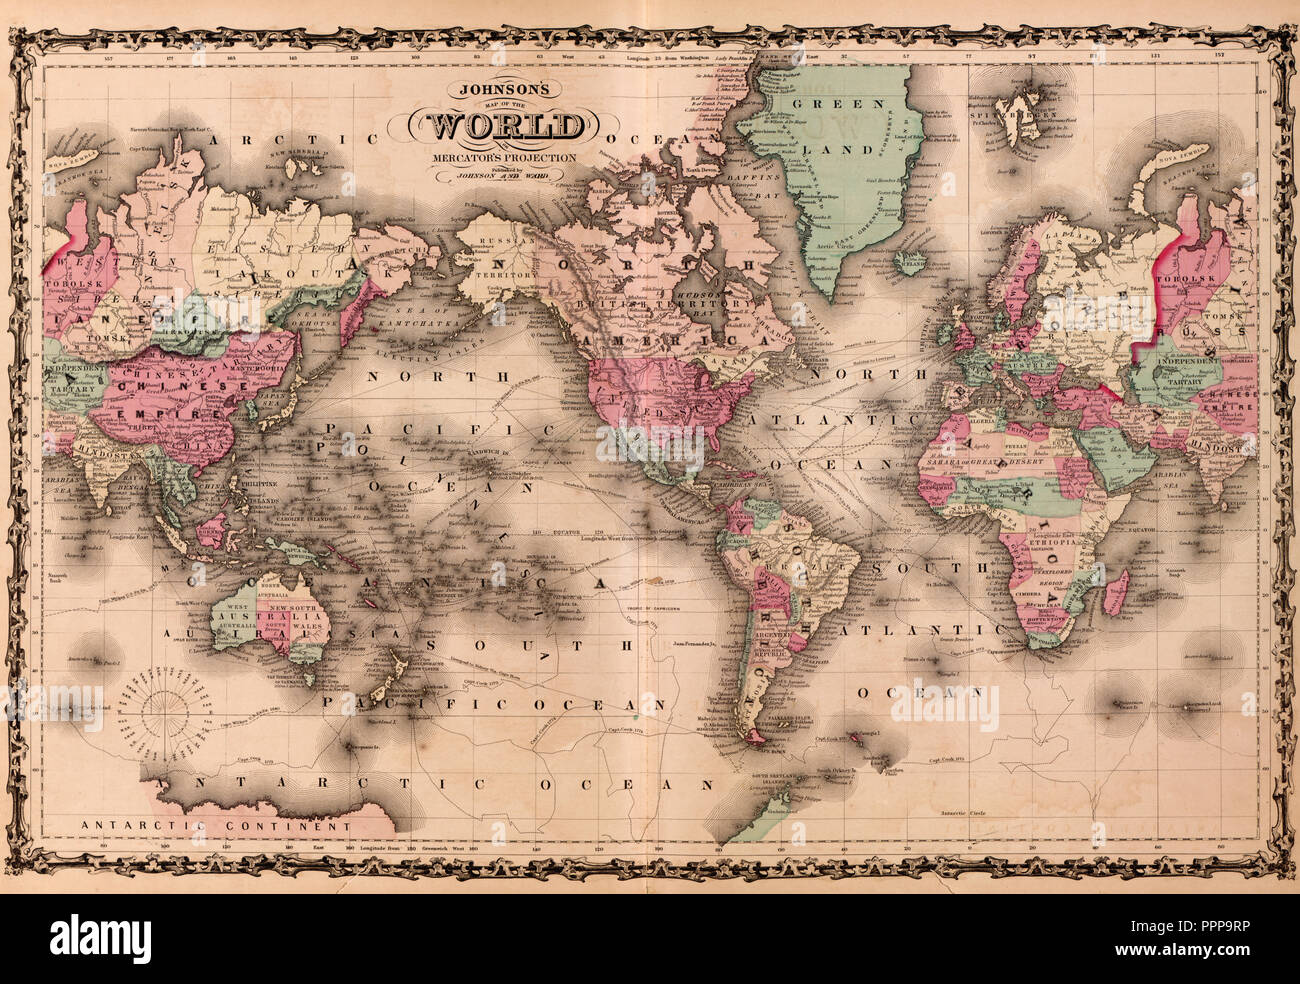 Johnson's Map of the World, circa 1862 - Stock Image